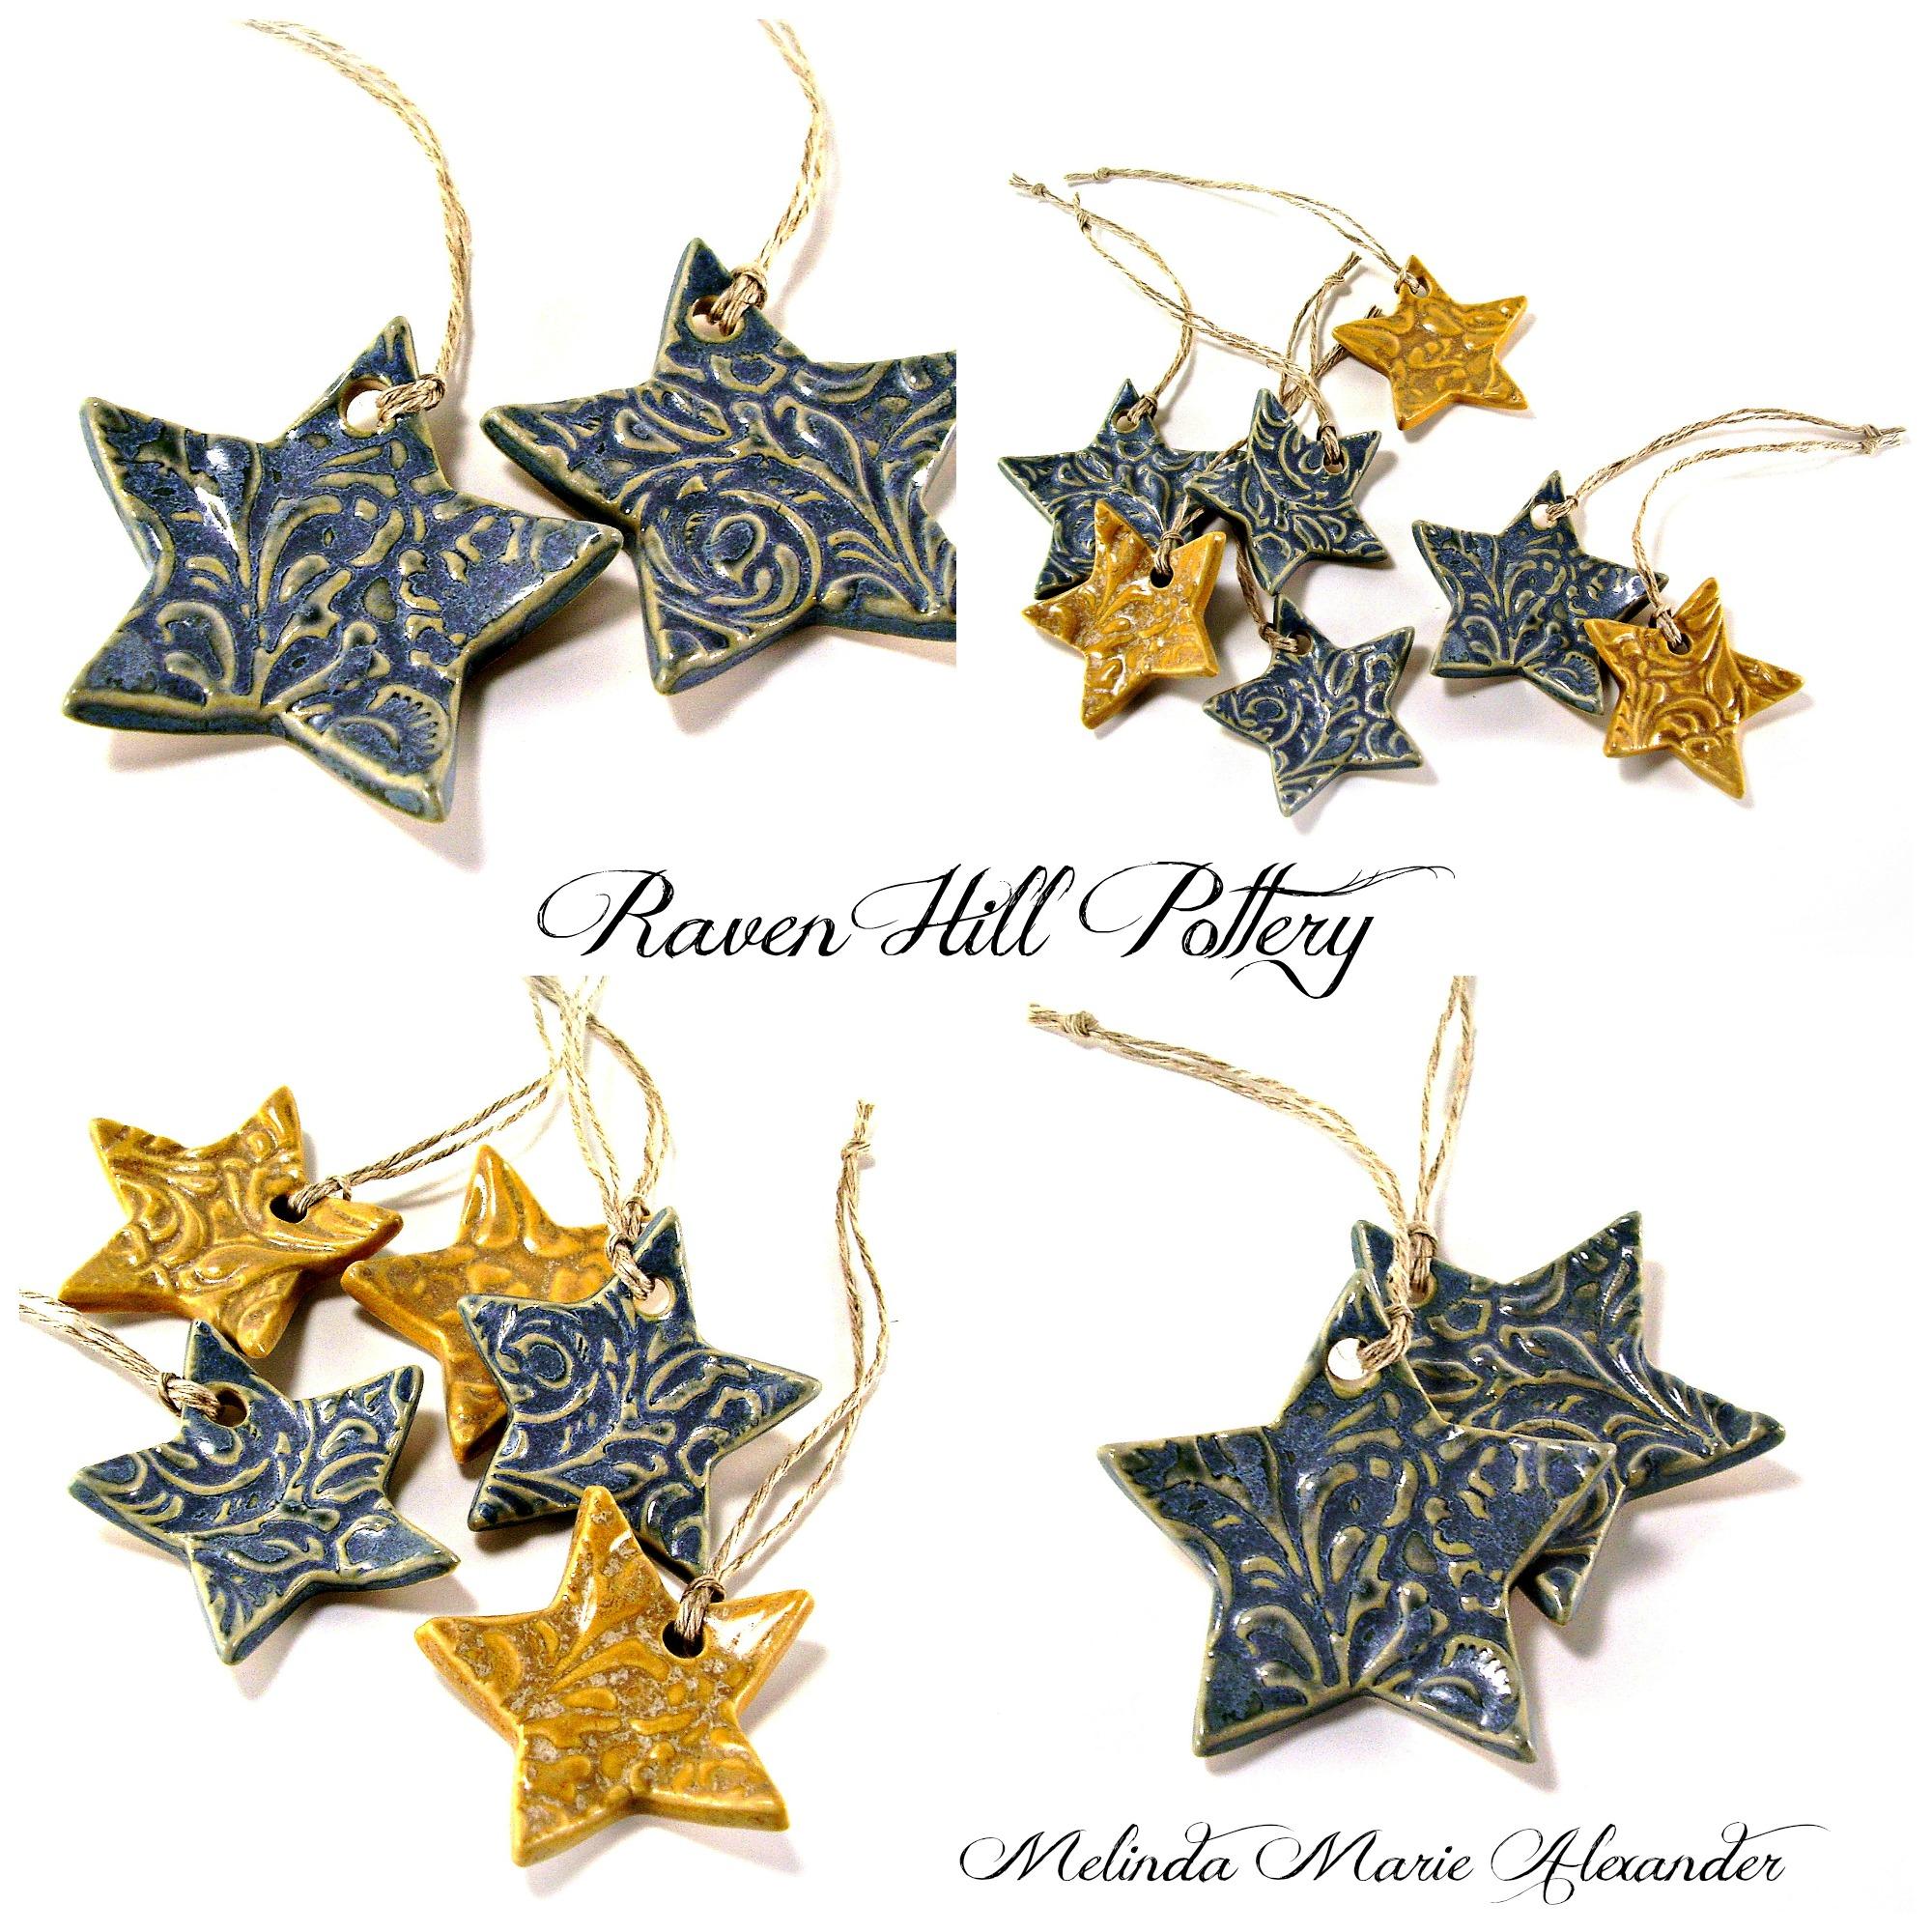 star ornaments melinda marie alexander ravenhillpottery.etsy.com with textjpg